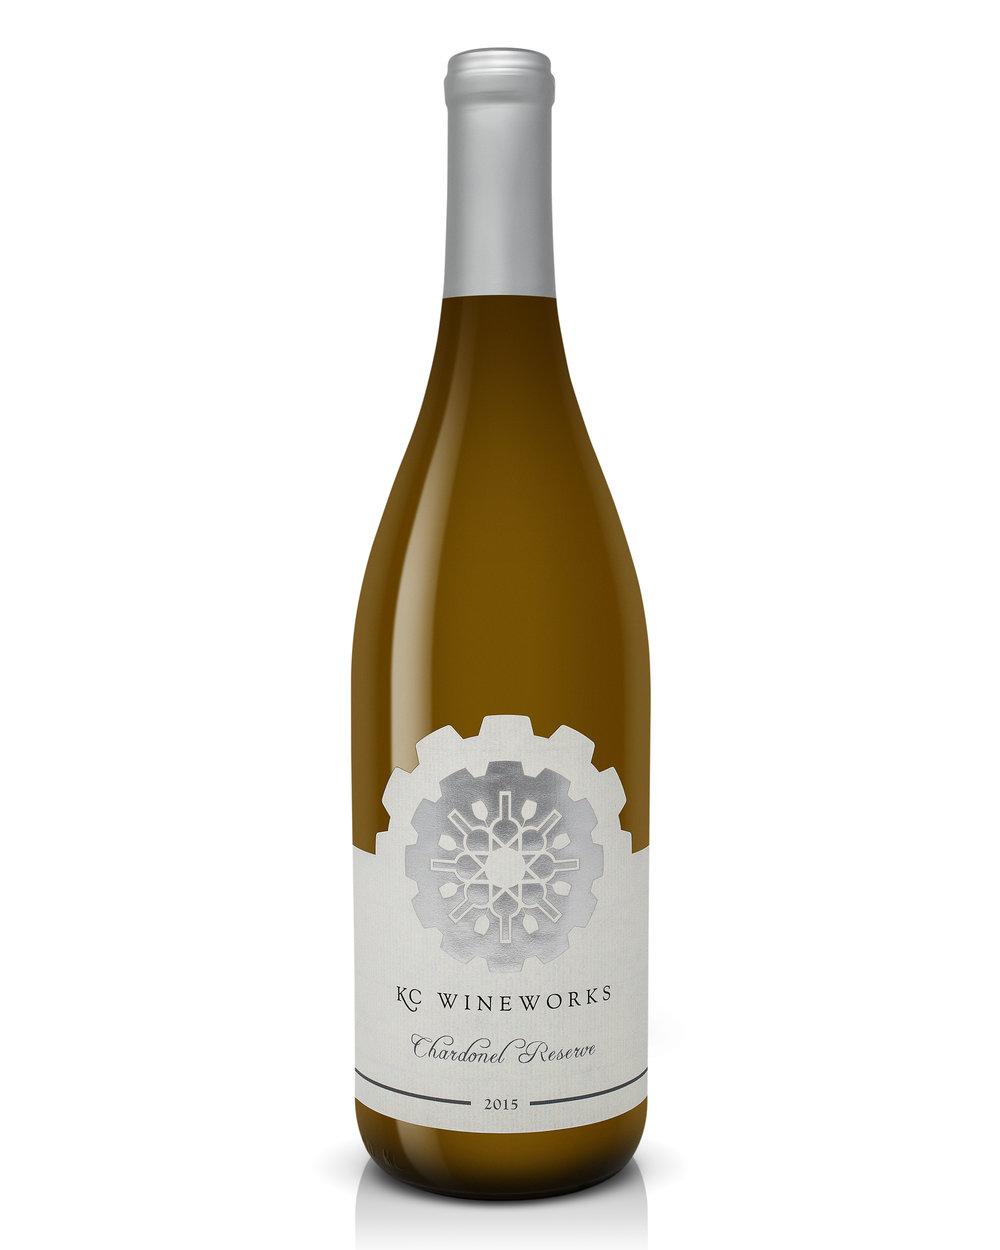 KC Wineworks Chardonel Reserve | Adri Guyer Photo 01.jpg